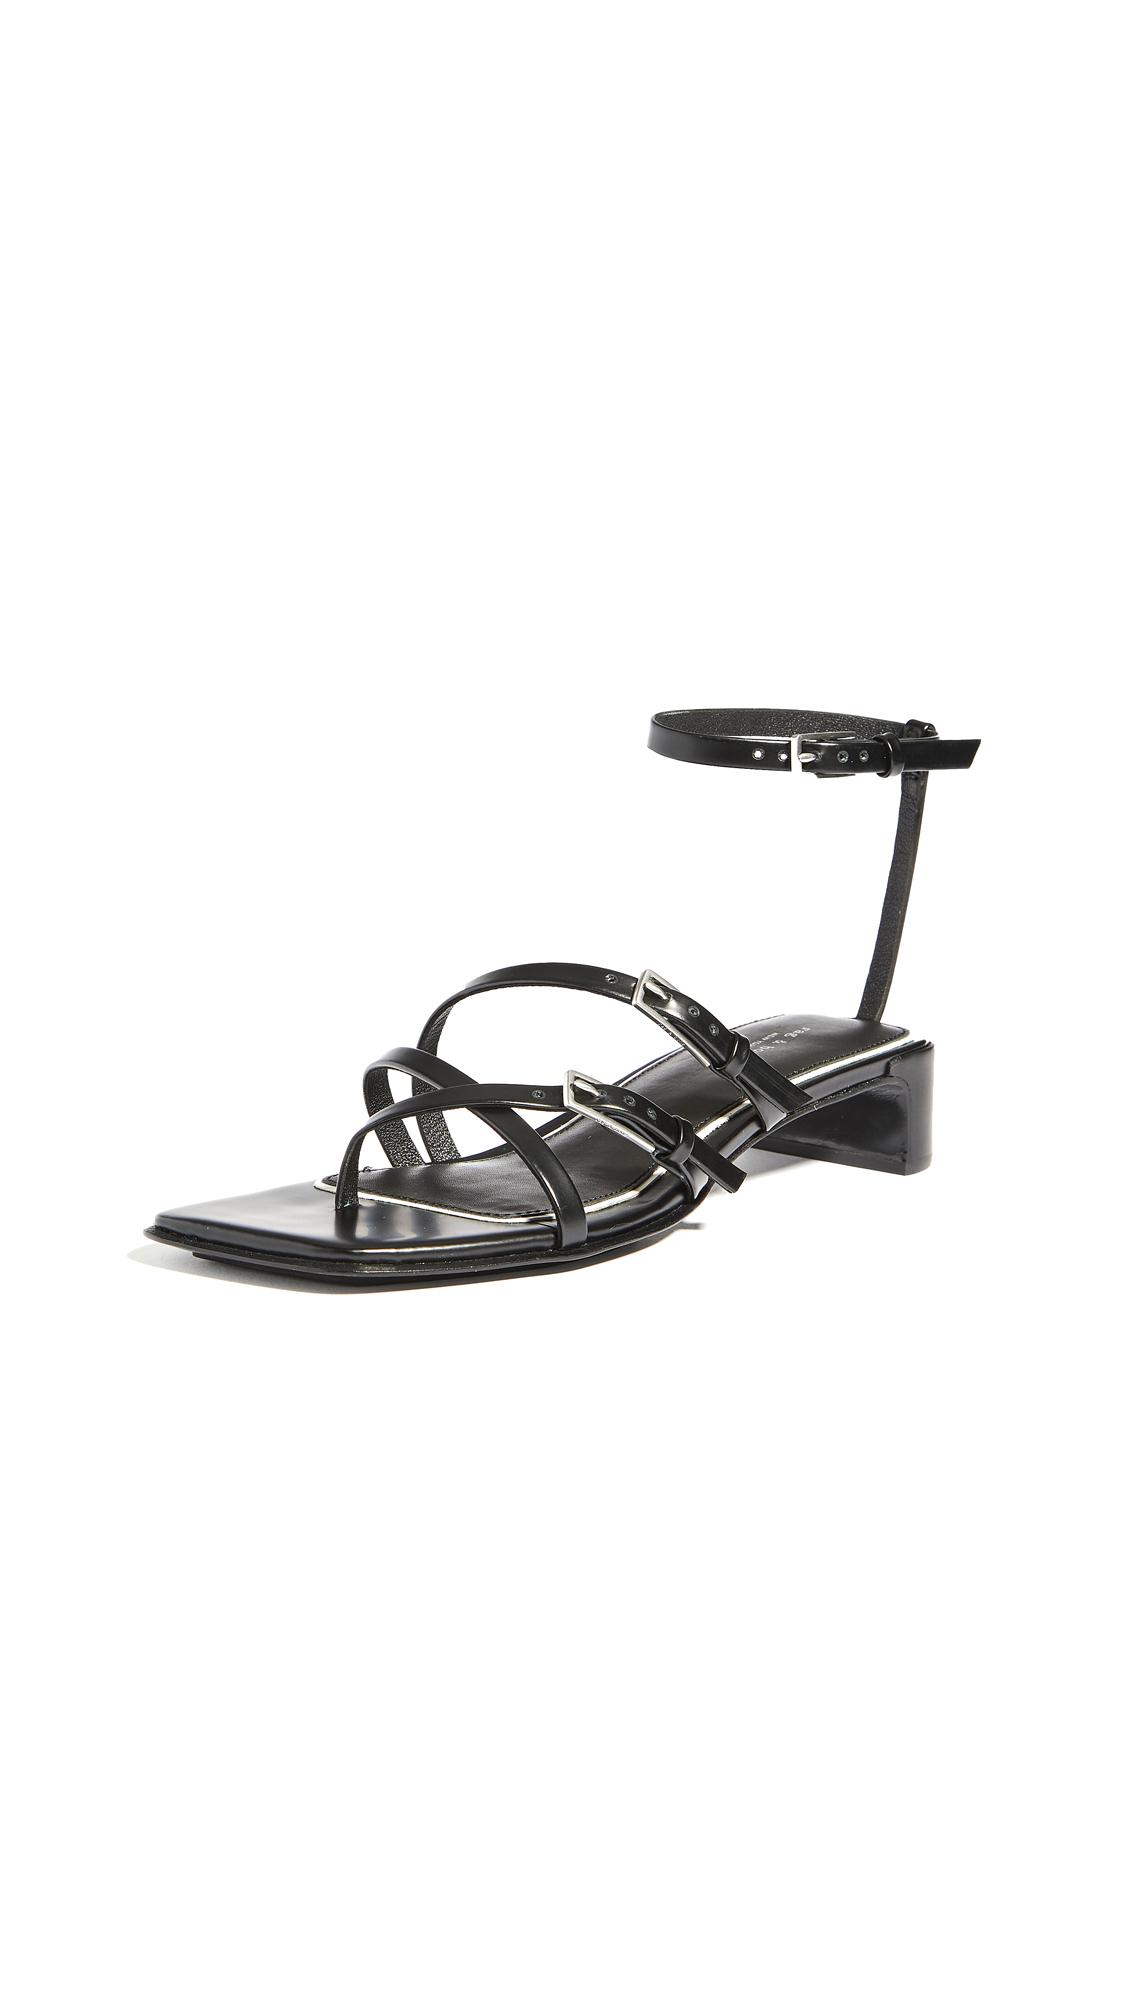 Buy Rag & Bone Calliope Mid Sandals online, shop Rag & Bone